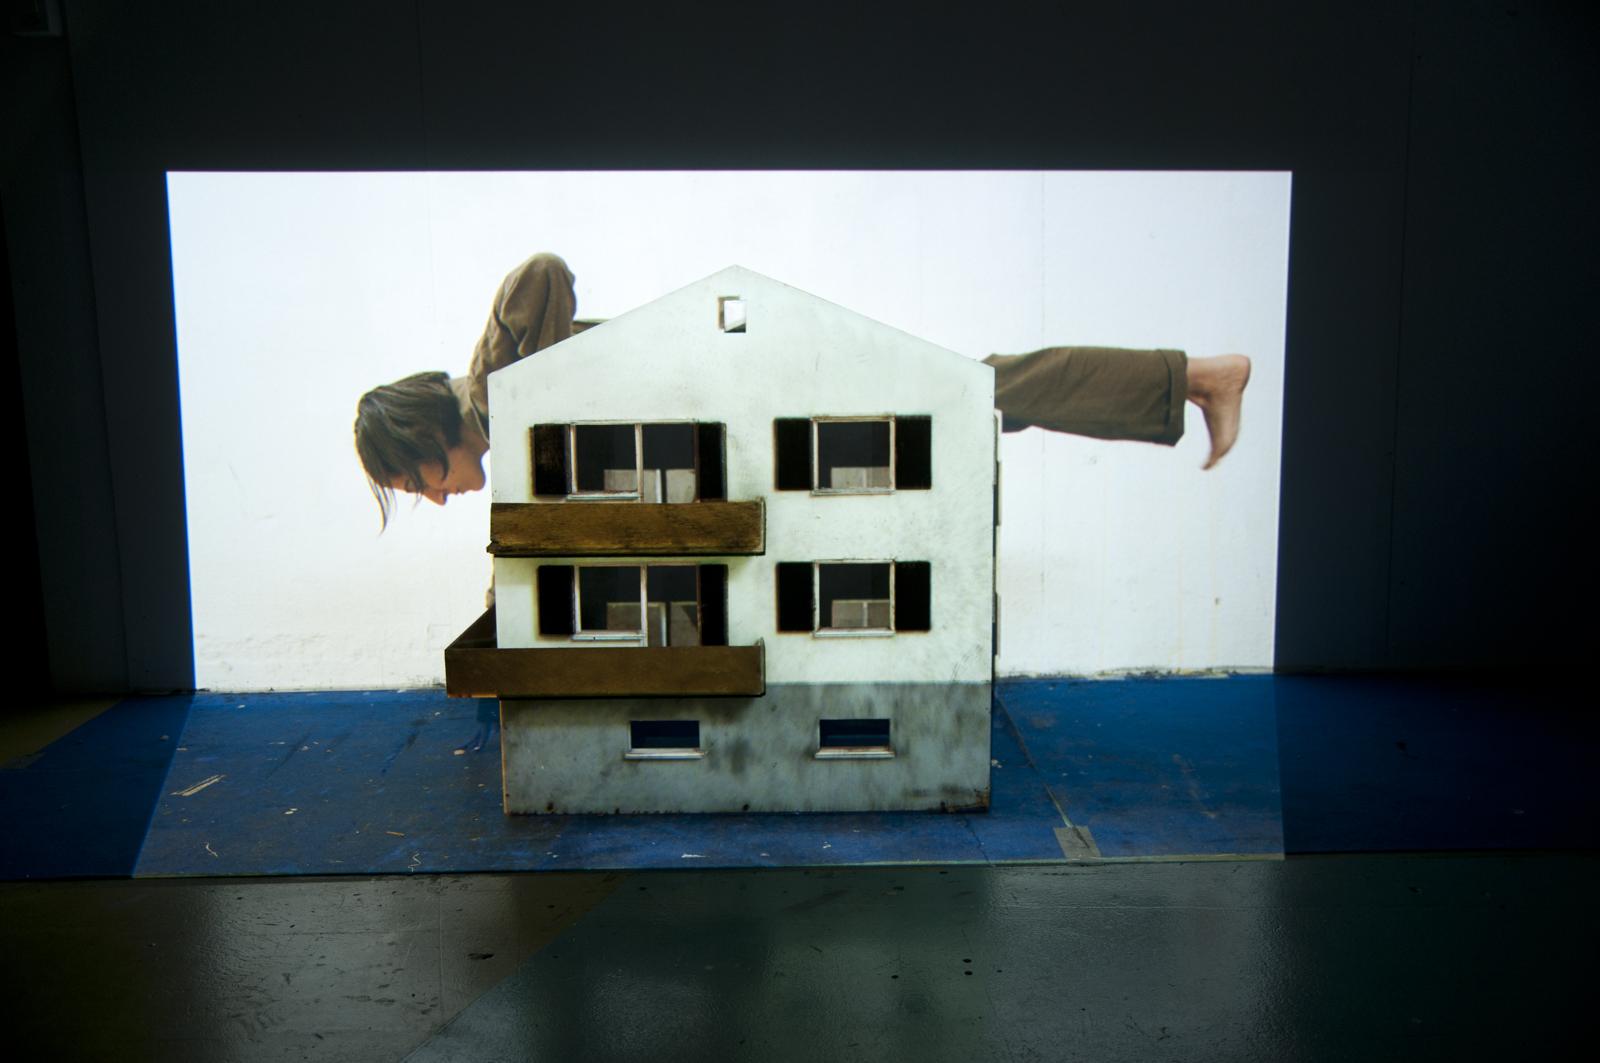 2013_Haus-im-Kopf_Projektionen_05